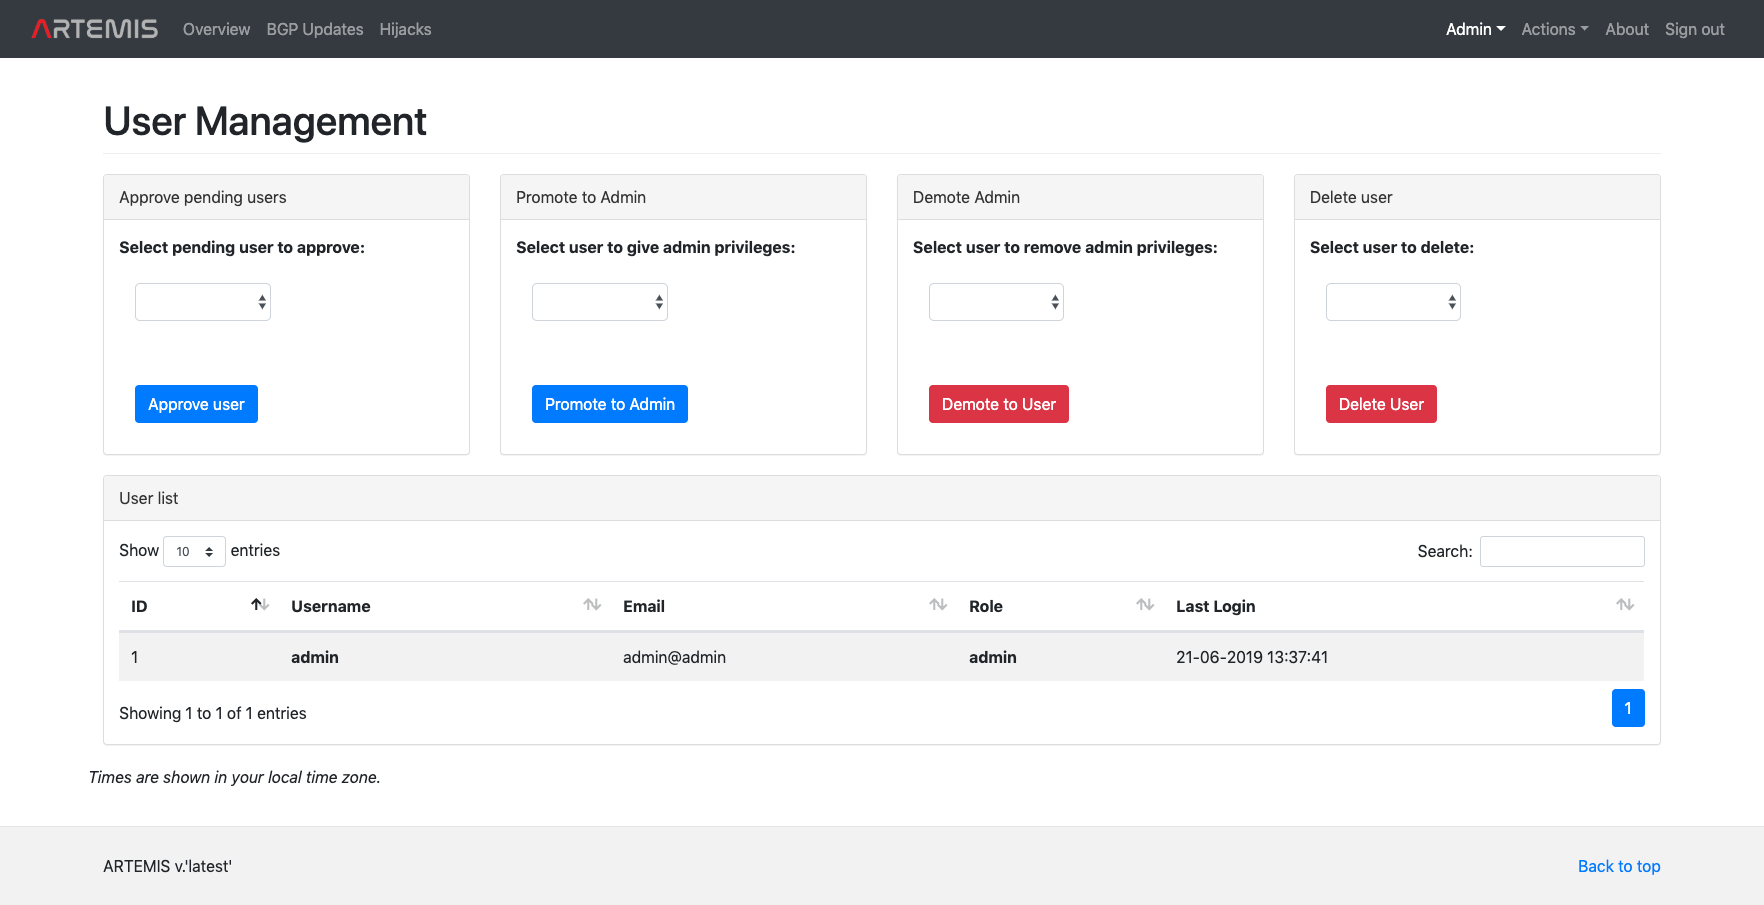 ARTEMIS - User Management Page